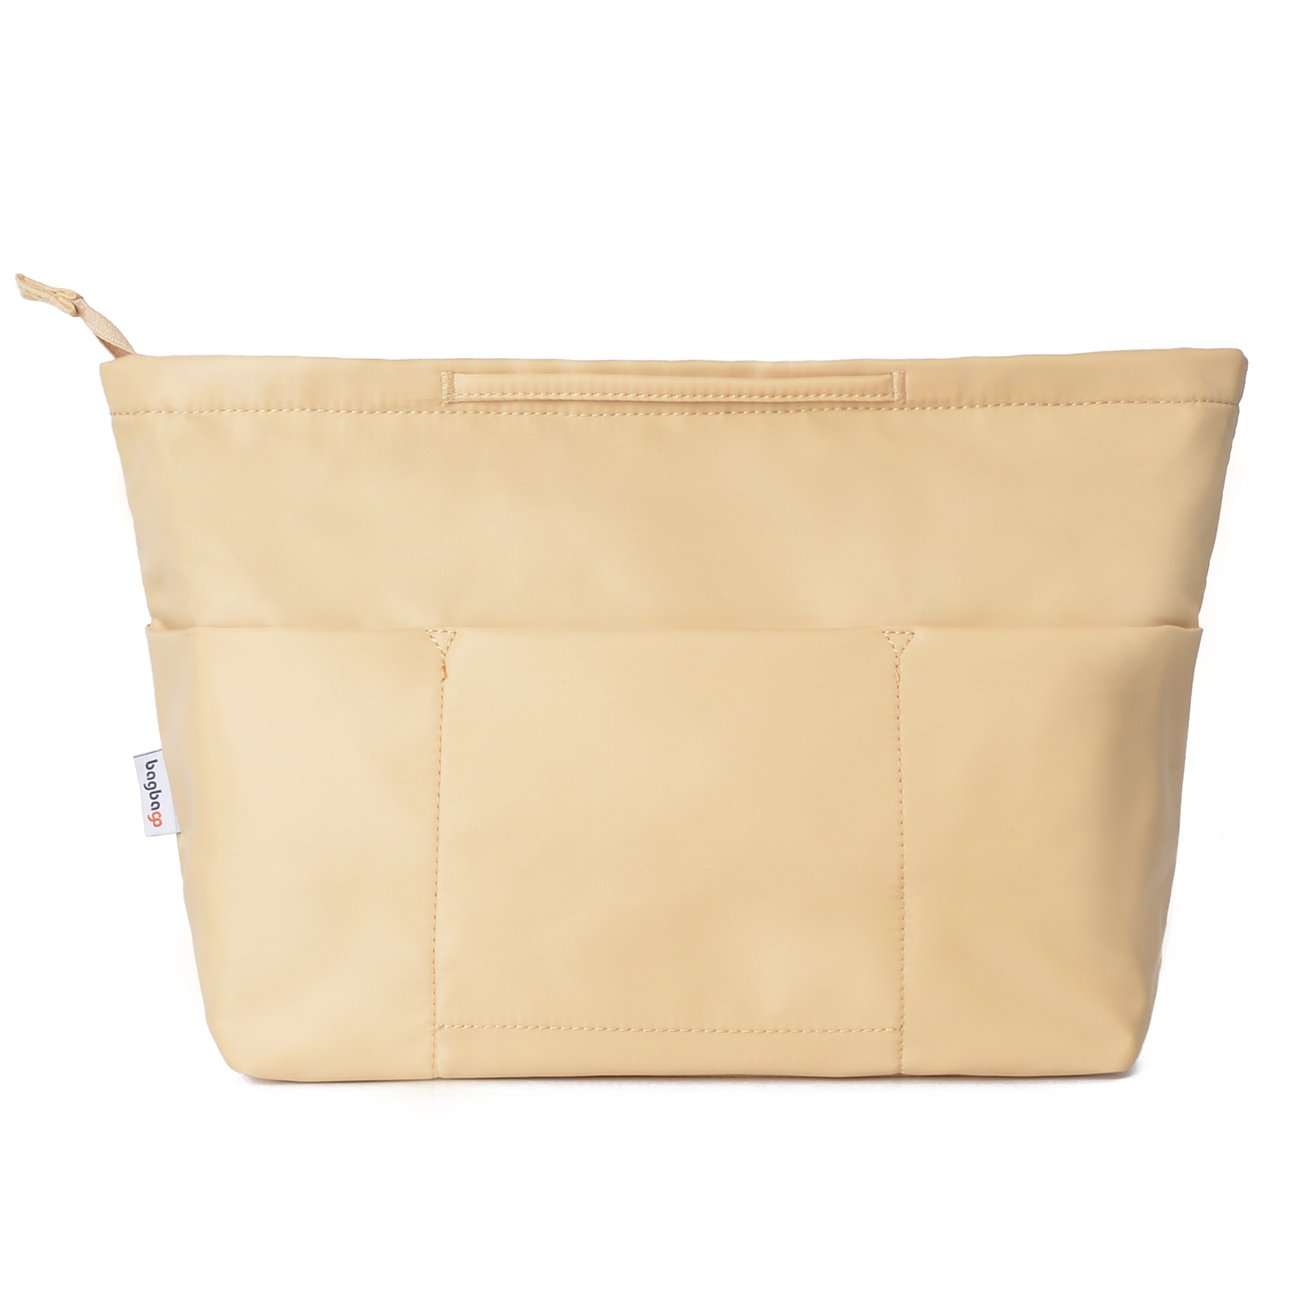 13 Pockets Handbag Organizer Liner Bag in Bag with Anti-theft Keychain (M,Khaki)